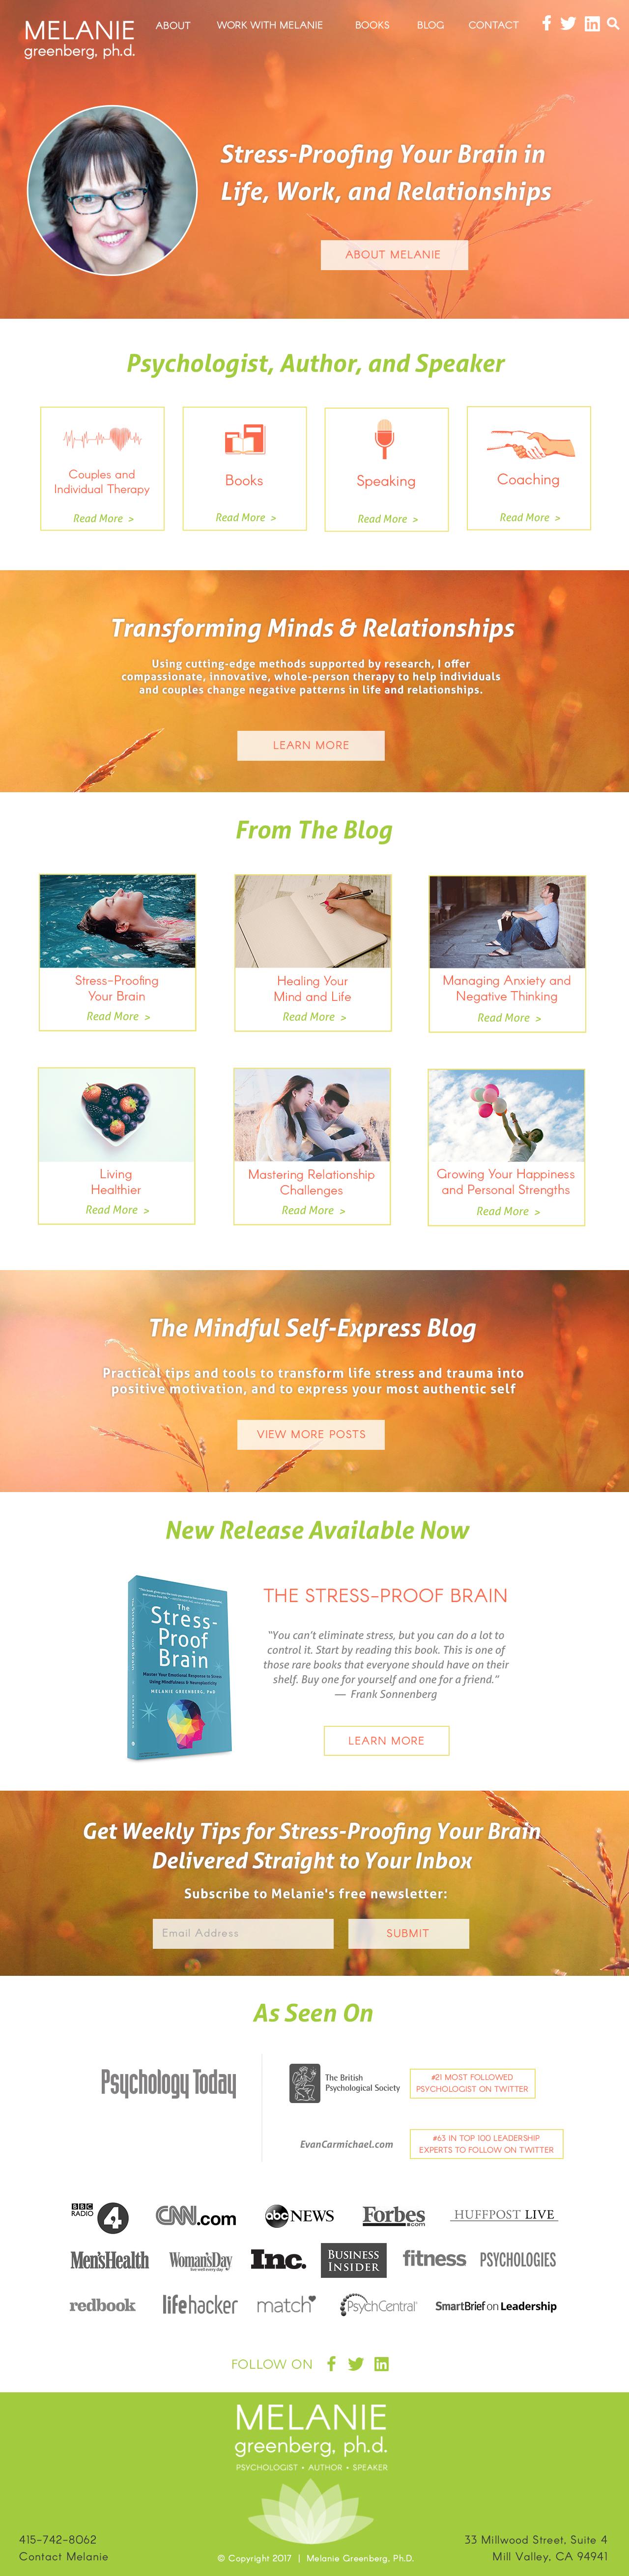 MelanieG homepage mockup